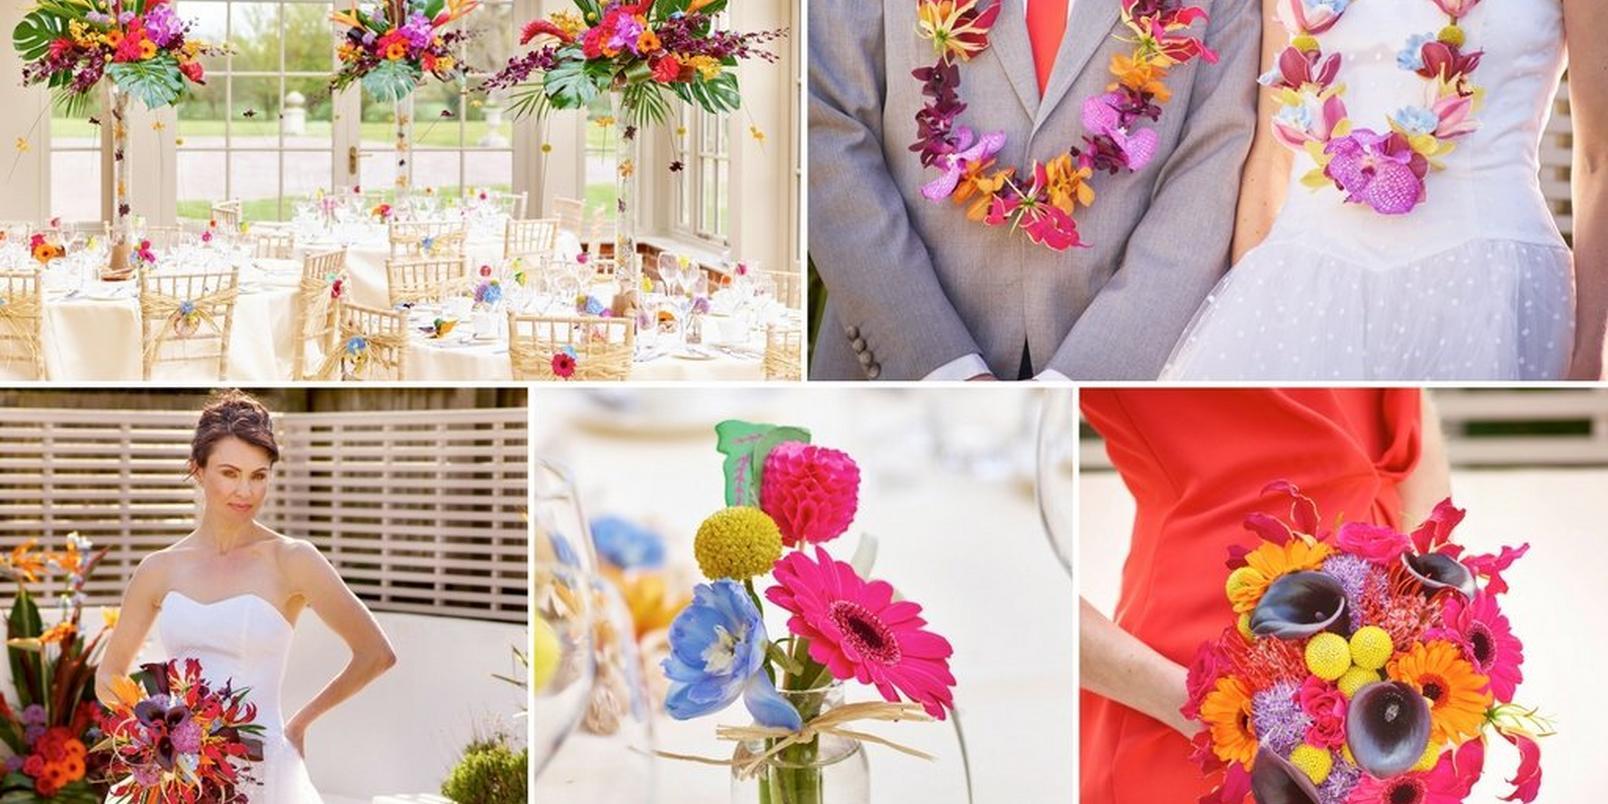 2_Untitled-design-2-summer-wedding-ideas